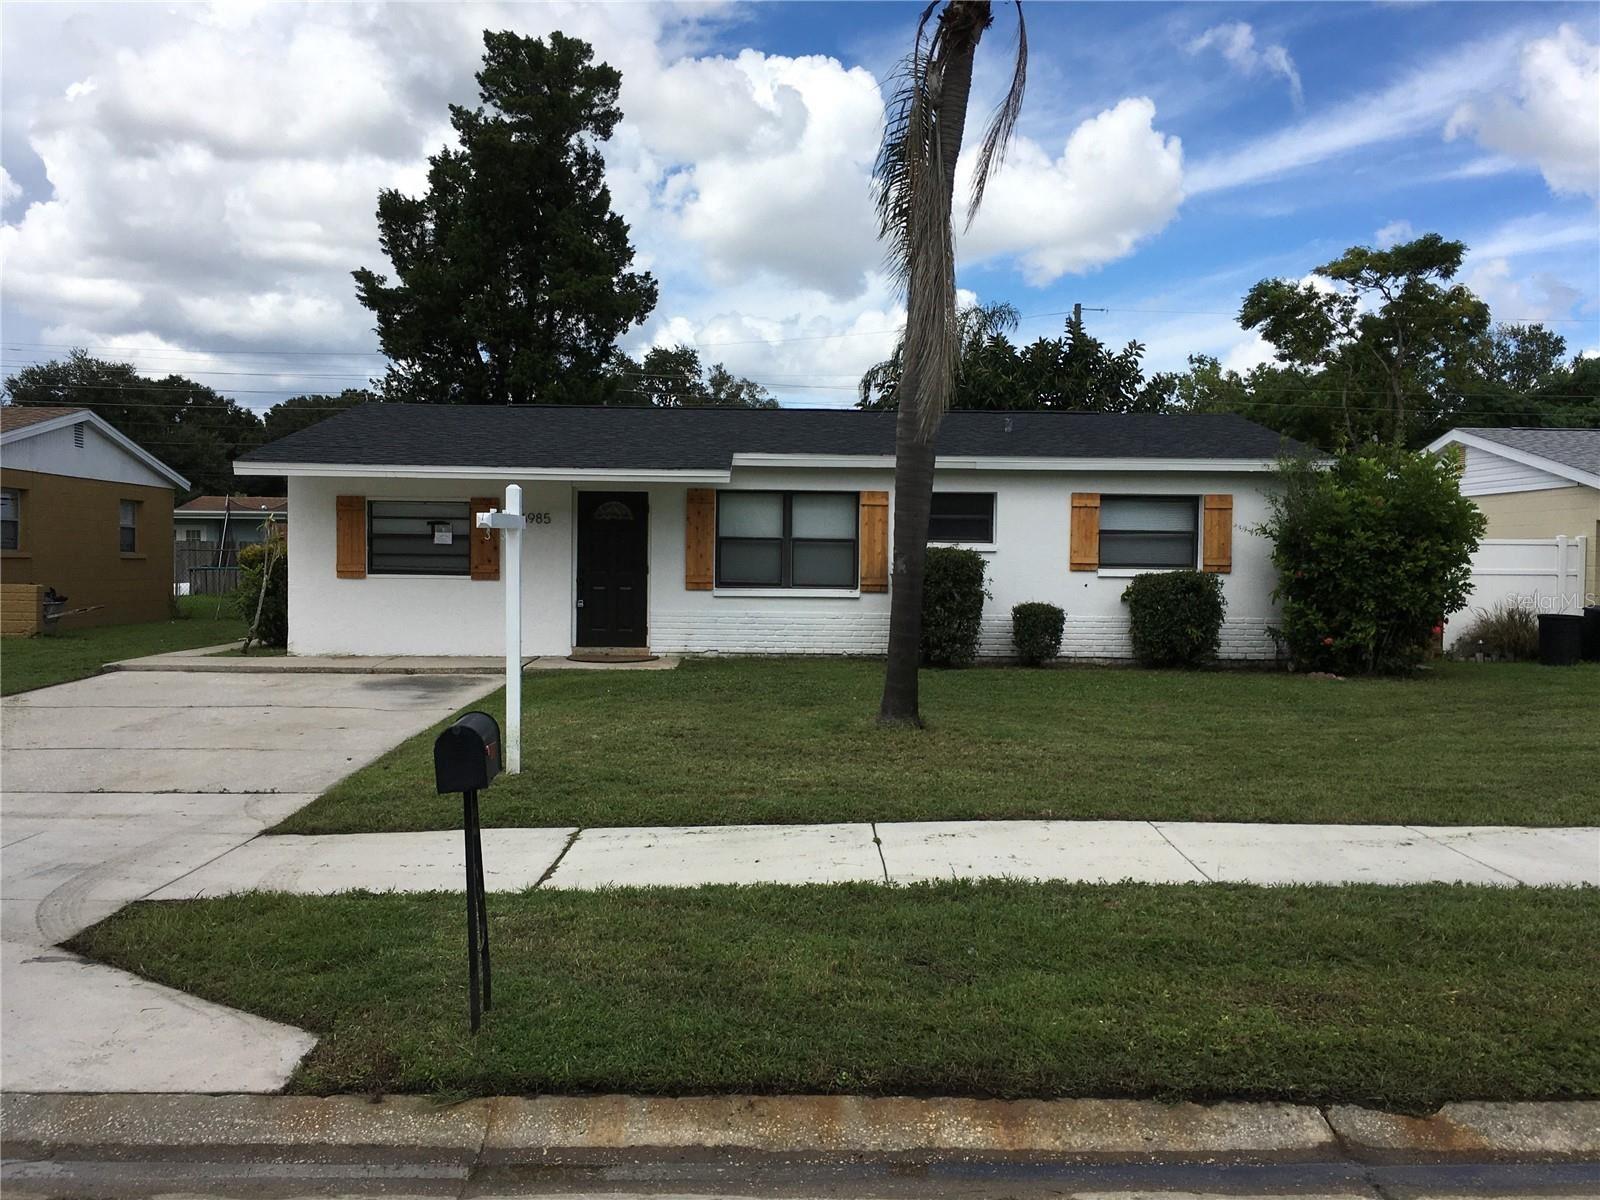 6985 77TH TERRACE N, Pinellas Park, FL 33781 - #: U8137134